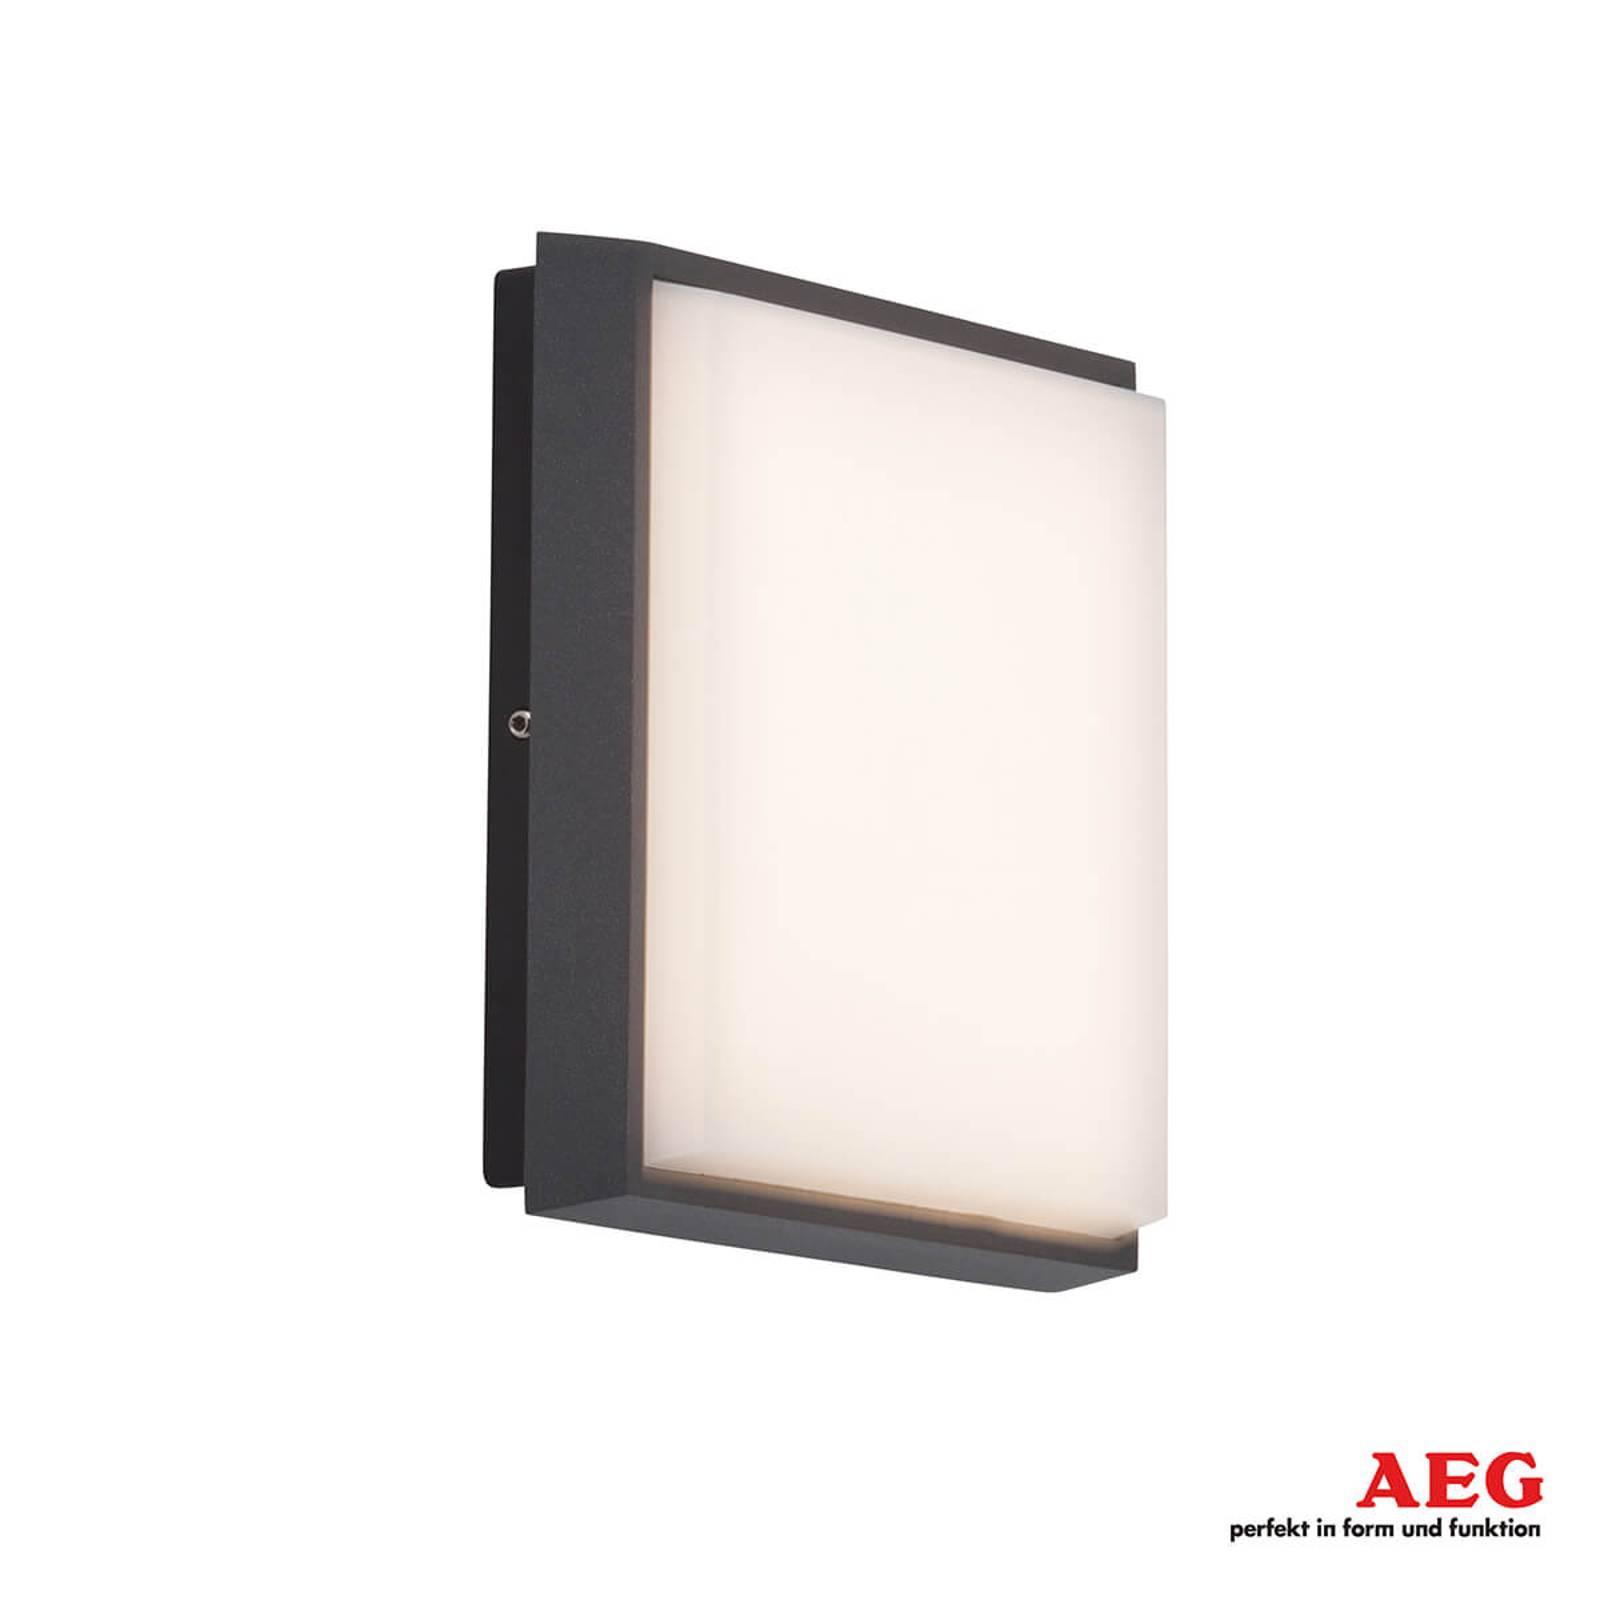 Kulmikas LED-ulkoseinälamppu Letan Square - 9 W